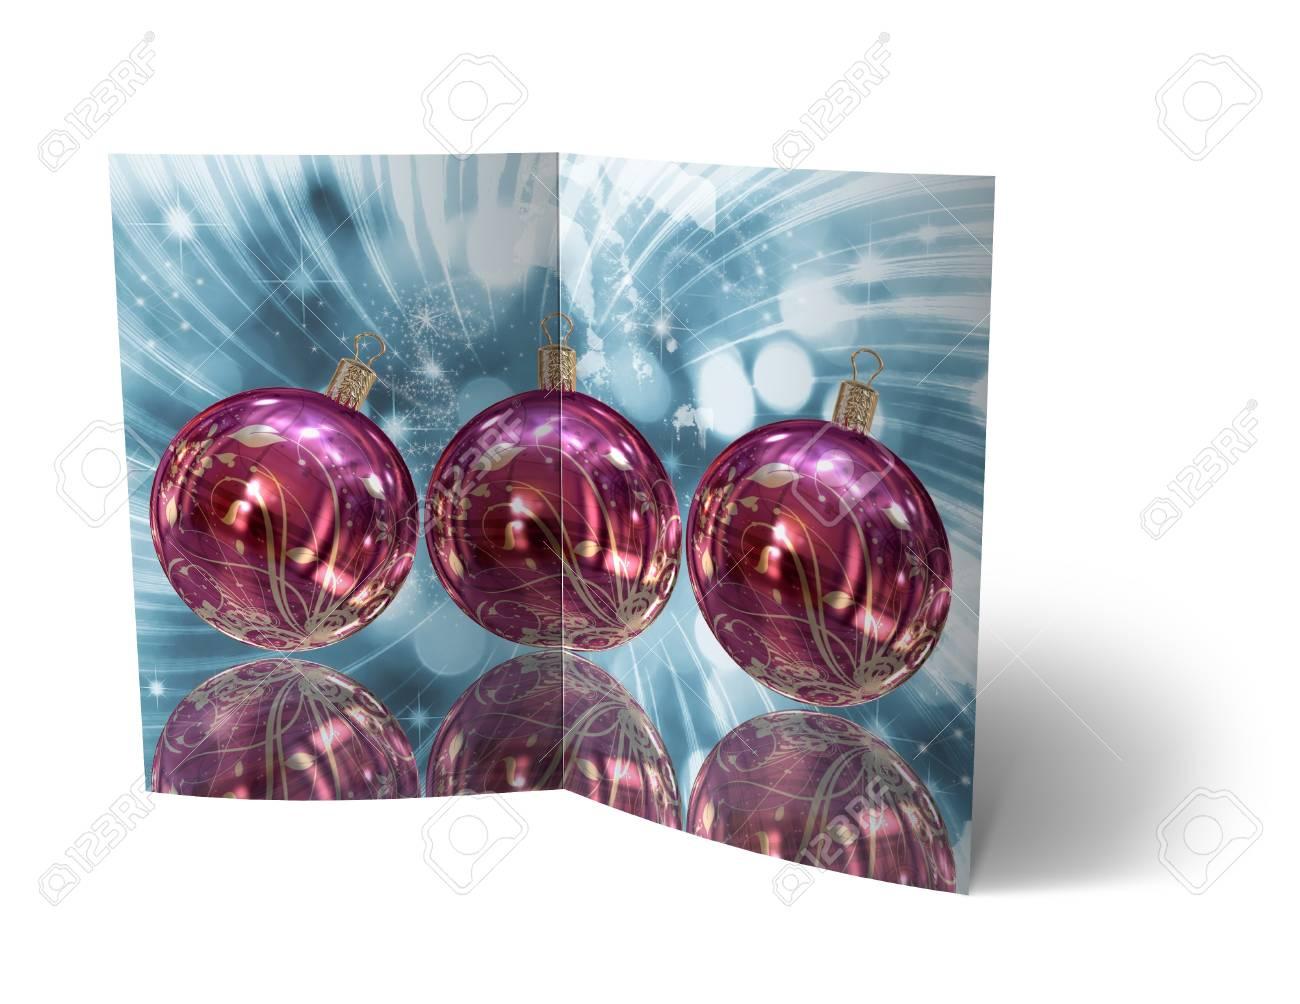 isolated 3d Christmas Balls brochure, Card Illustration Stock Illustration - 16023405